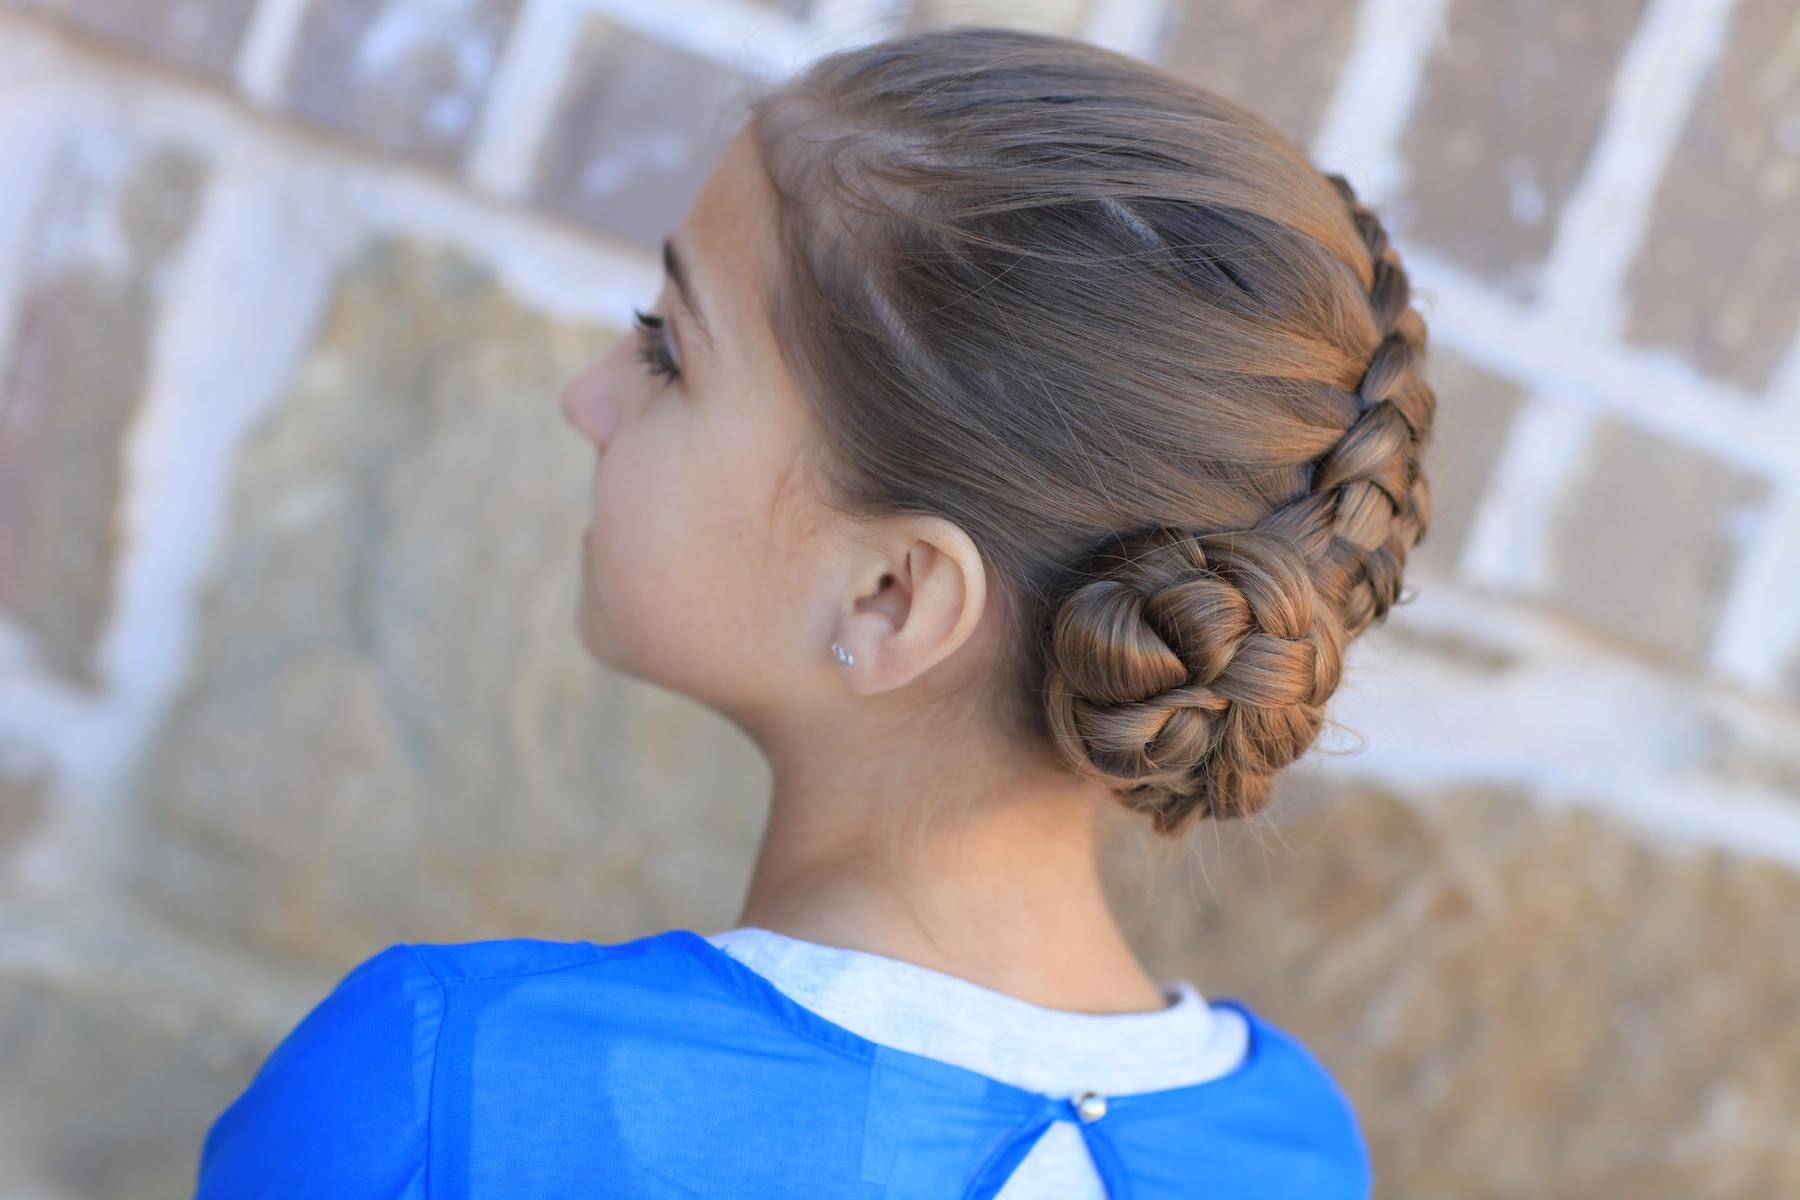 How To Create A Zipper Braid Updo Hairstyles Cute Girls Hairstyles